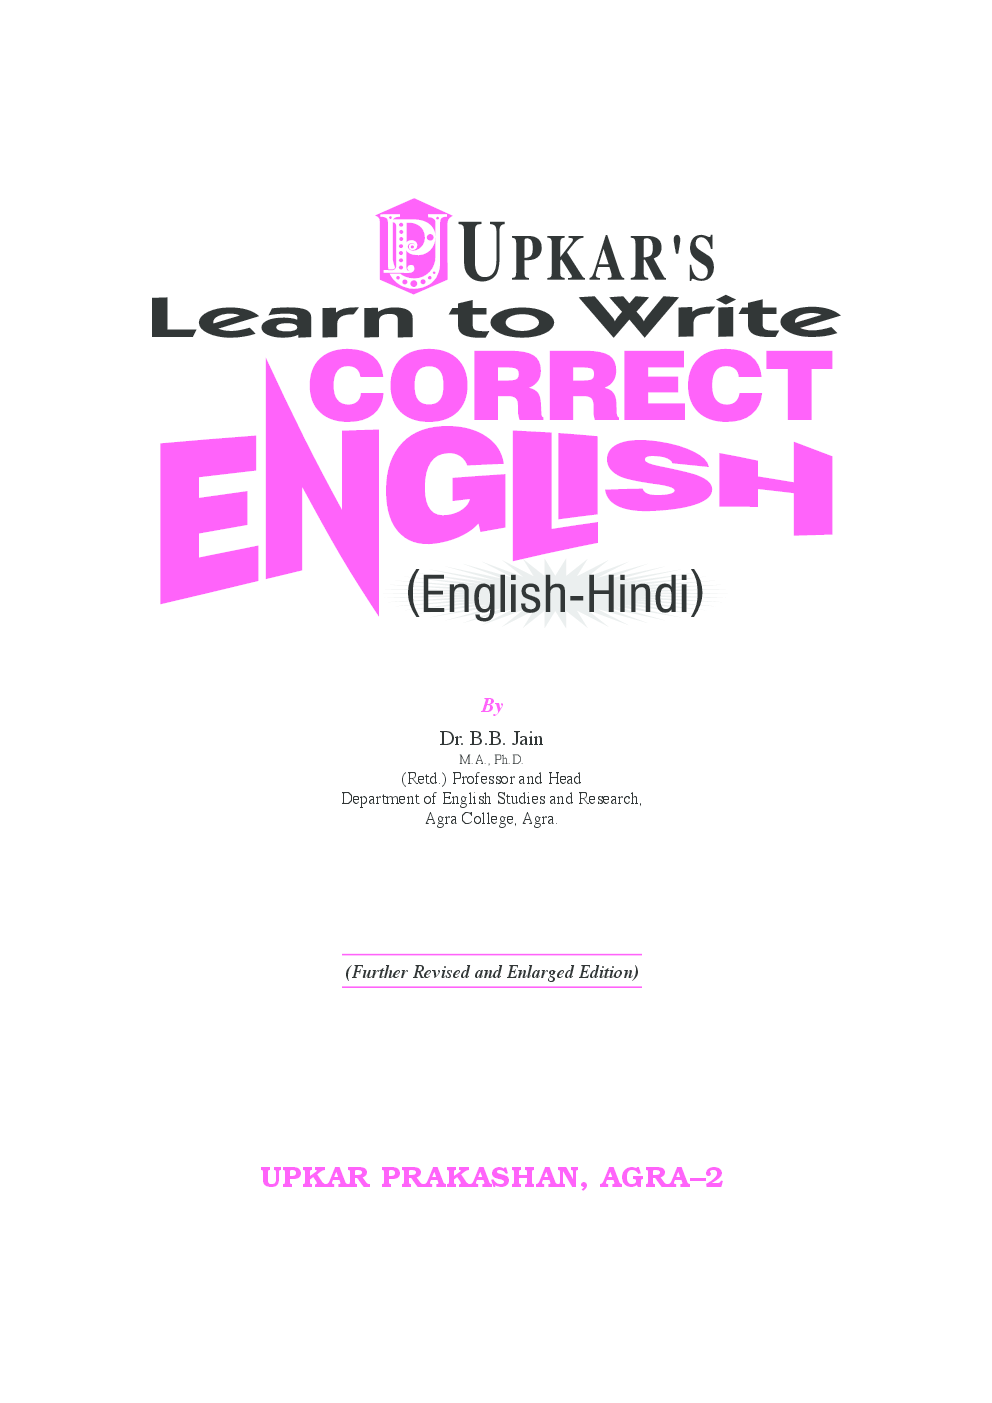 Learn to Write Correct English (Eng.-Hindi) - Page 2